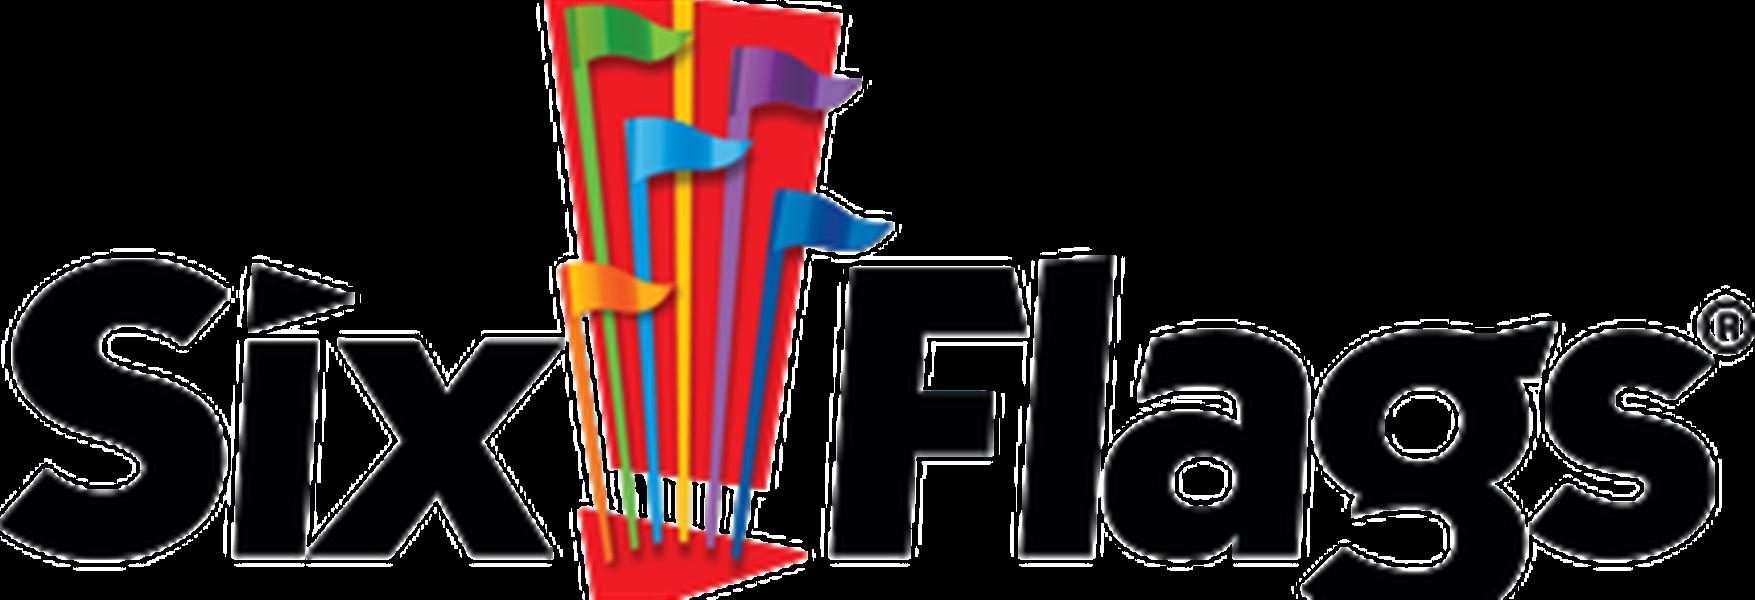 4fe48456-ec16-4eb2-8295-2864586f11e9_Six_Flags_Over_Texas_logo.png